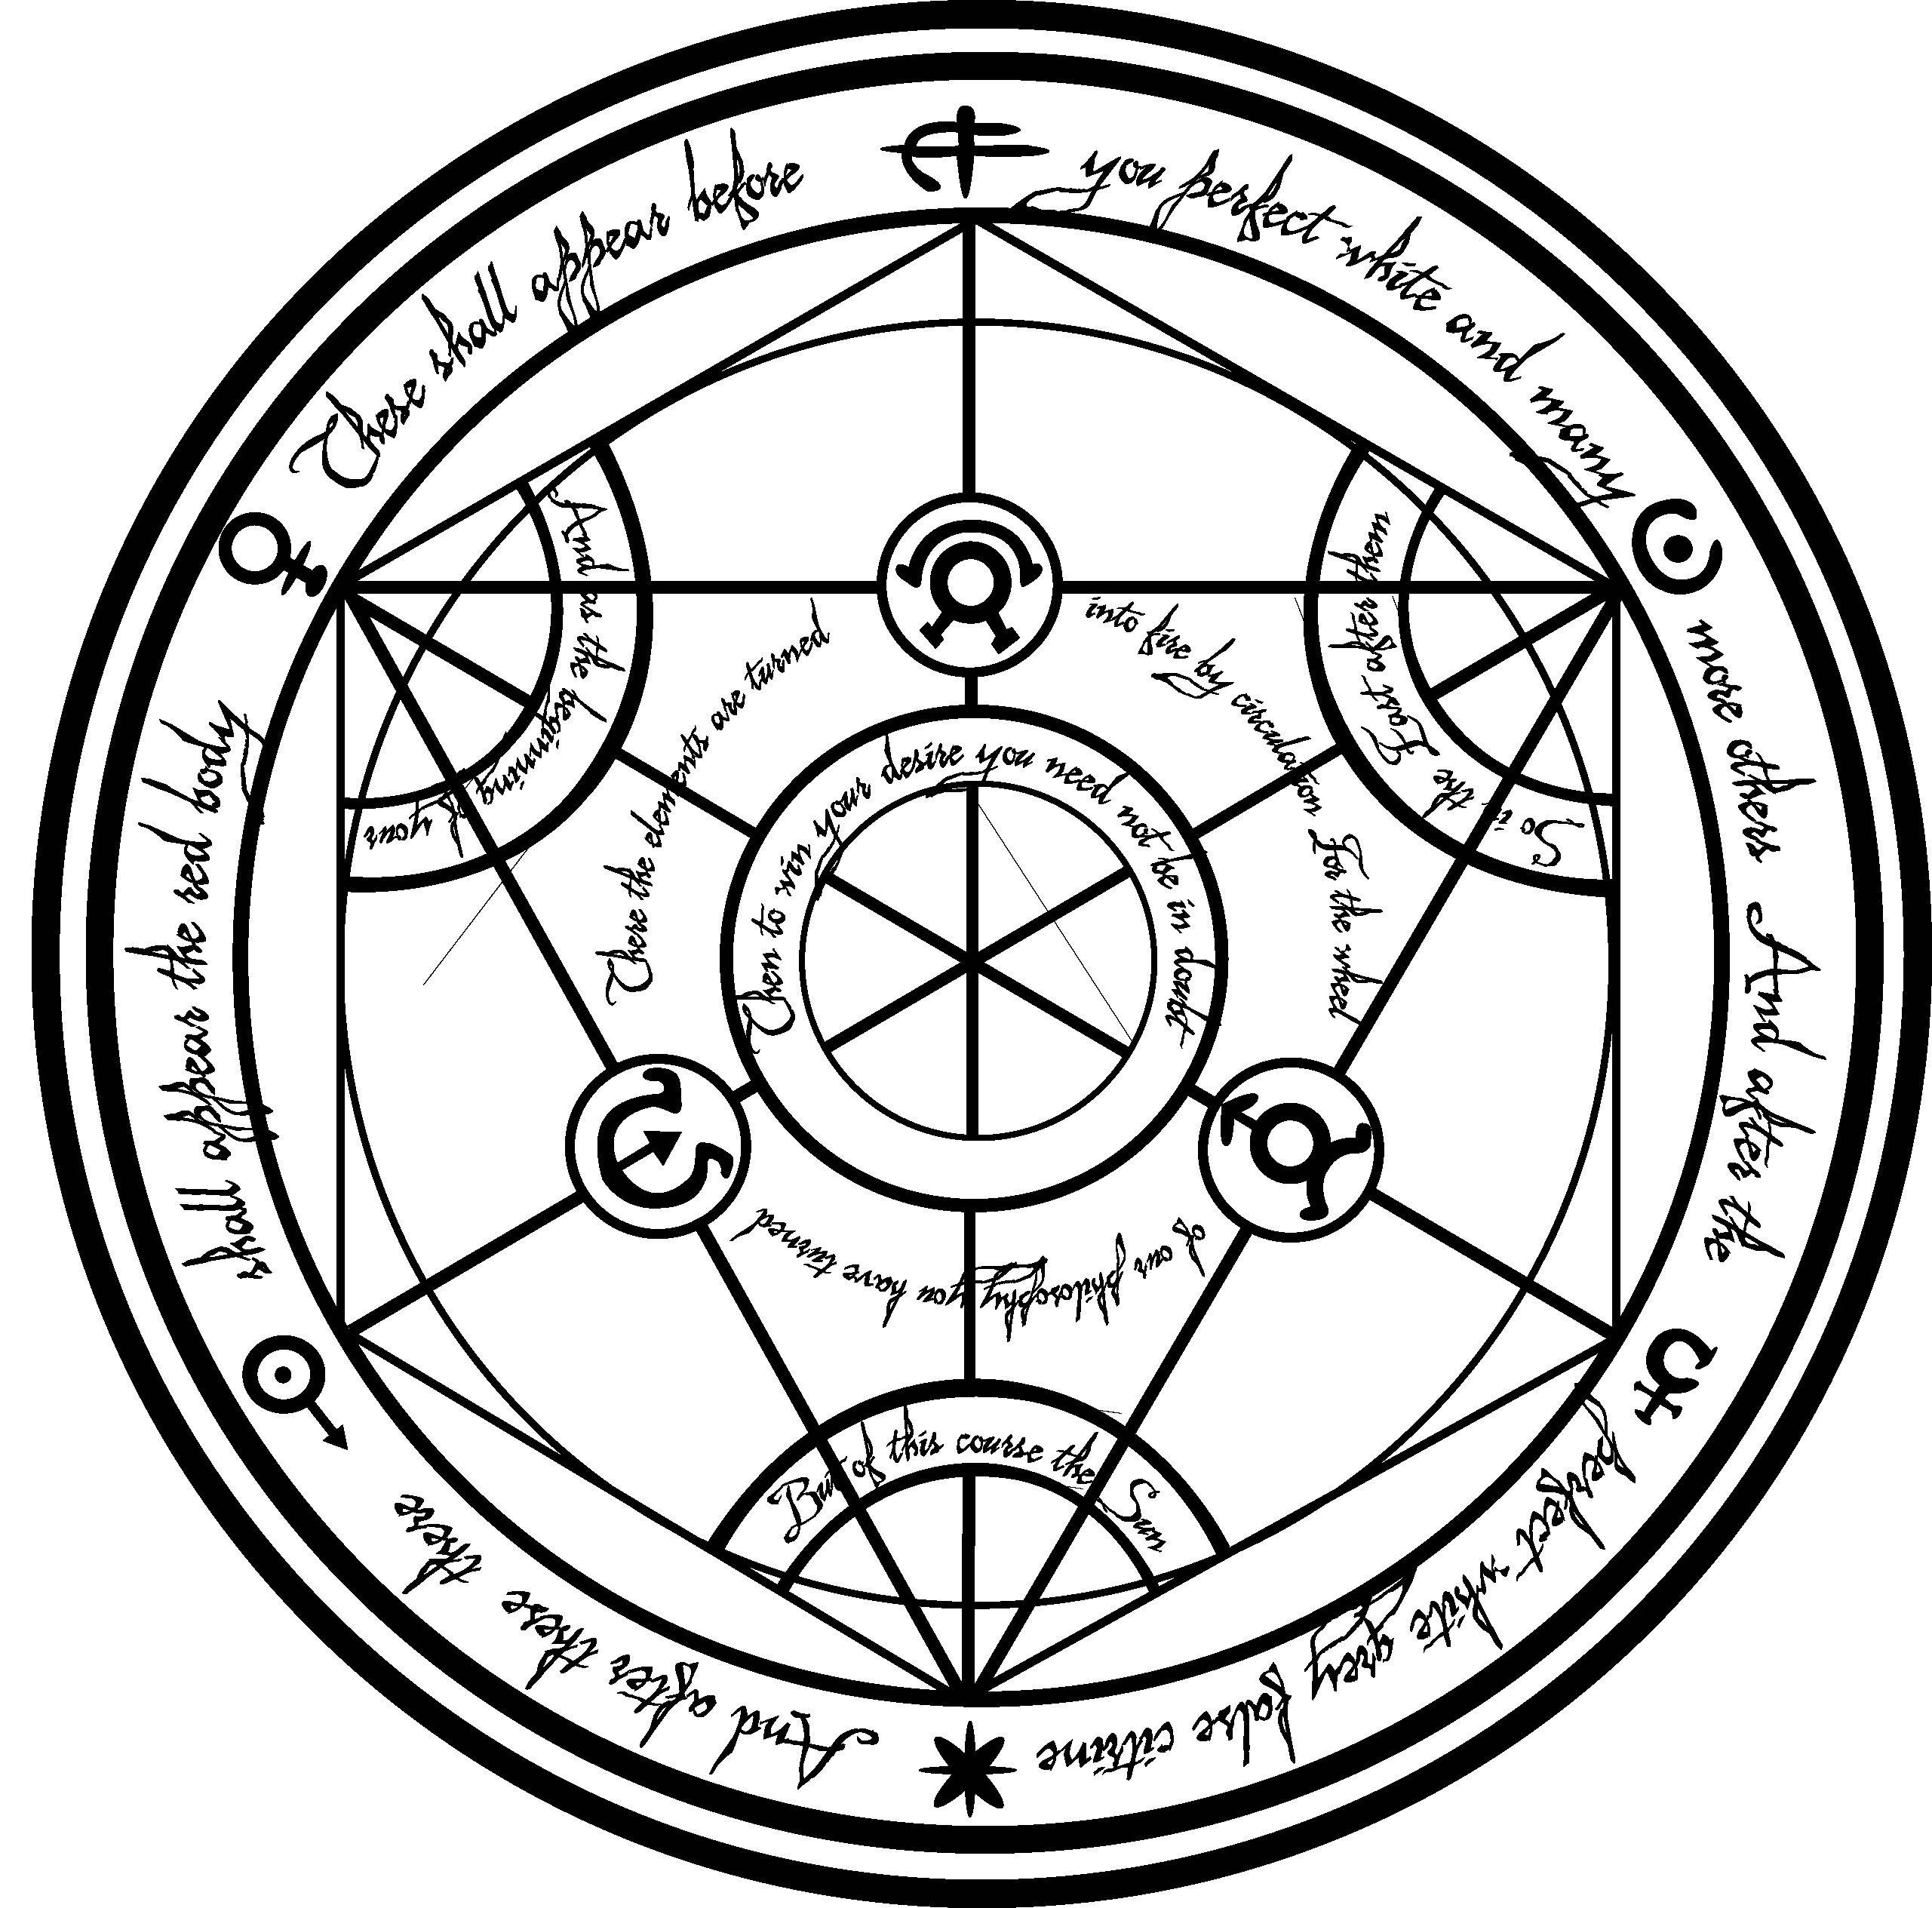 Transmutation Circle Tattoo: Transmutation_Circle_by_KoalaExe.jpg 2,561×2,529 Pixels